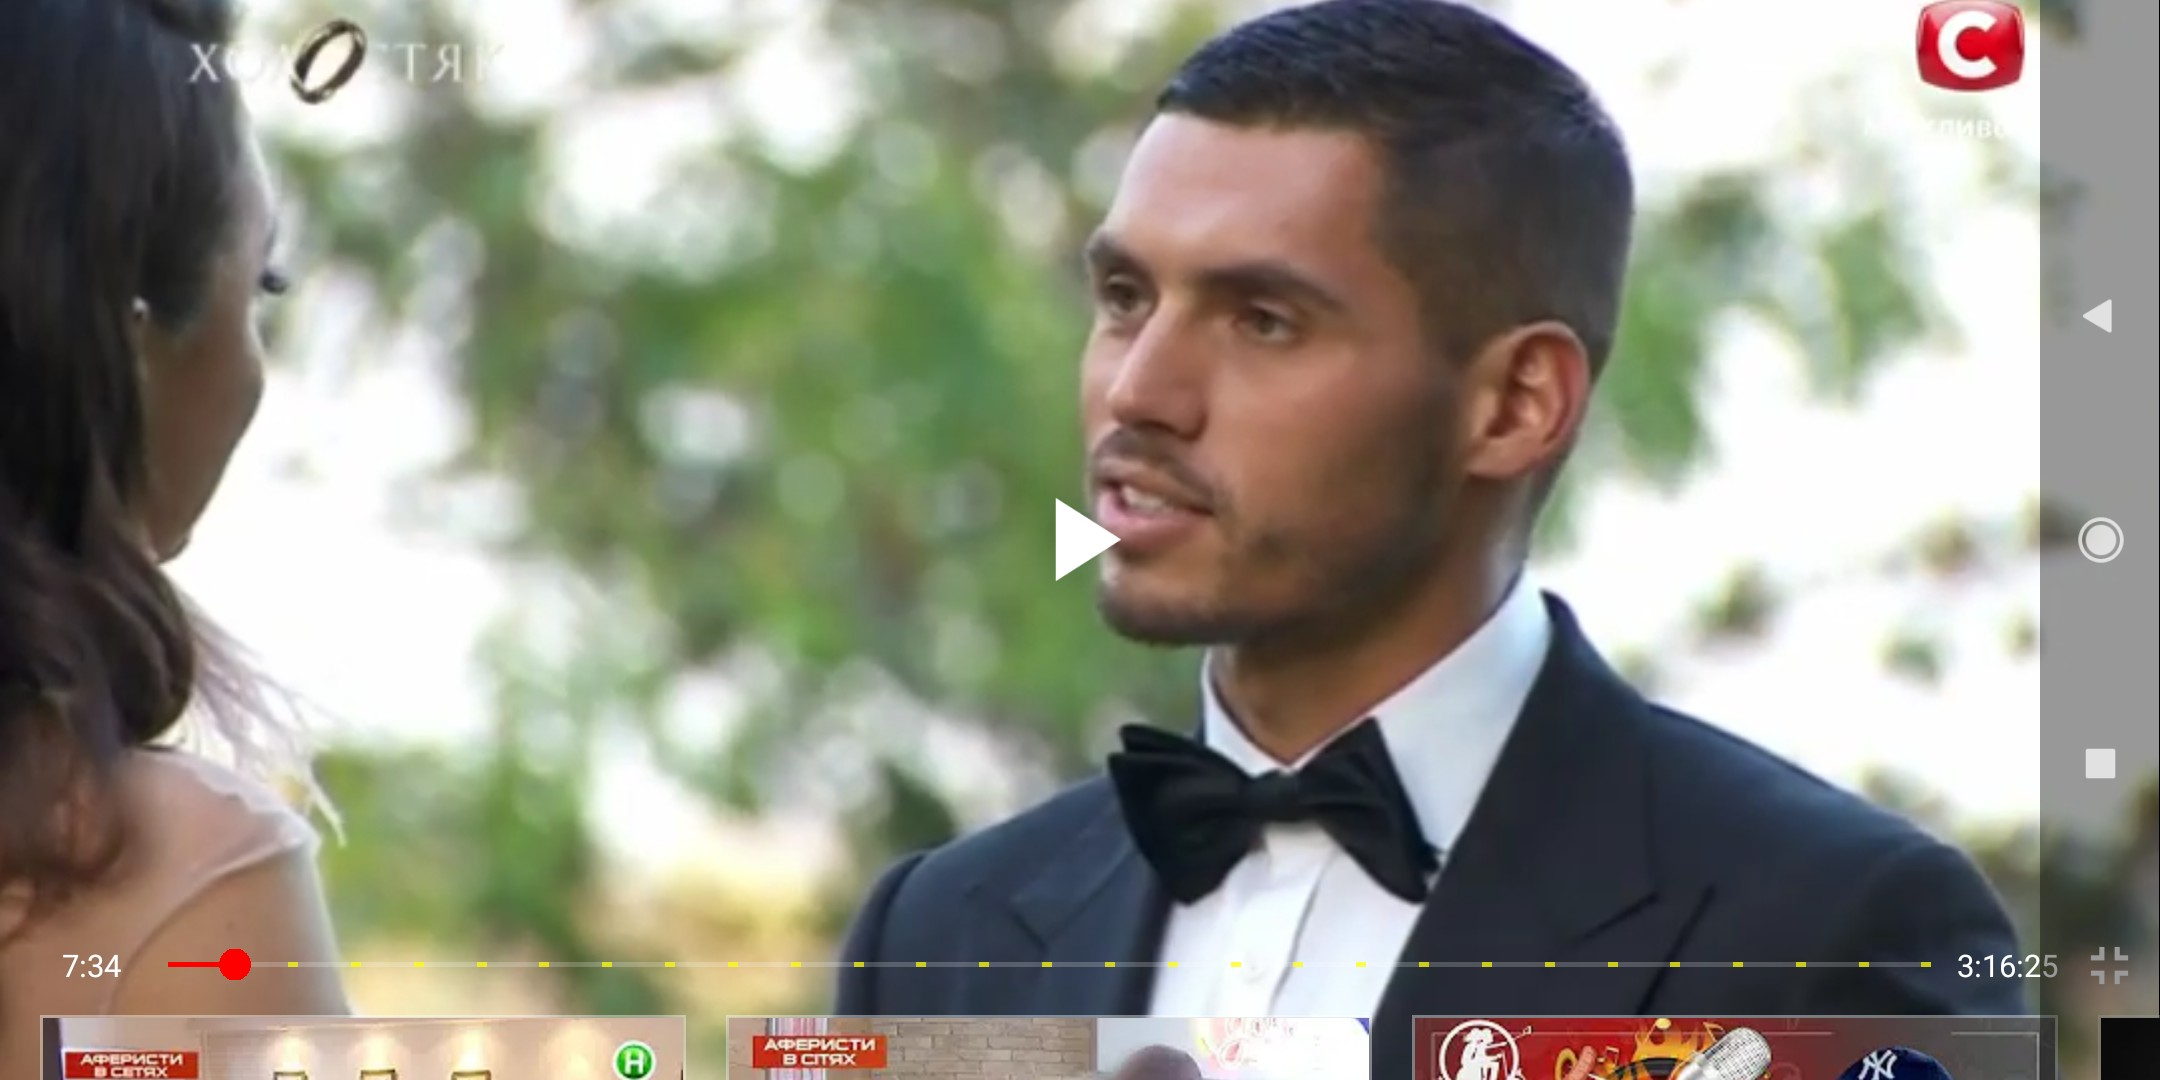 Bachelor Ukraine - Season 9 - Nikita Dobrynin - *Sleuthing Spoilers* - Page 10 JeAYjyJVHZk